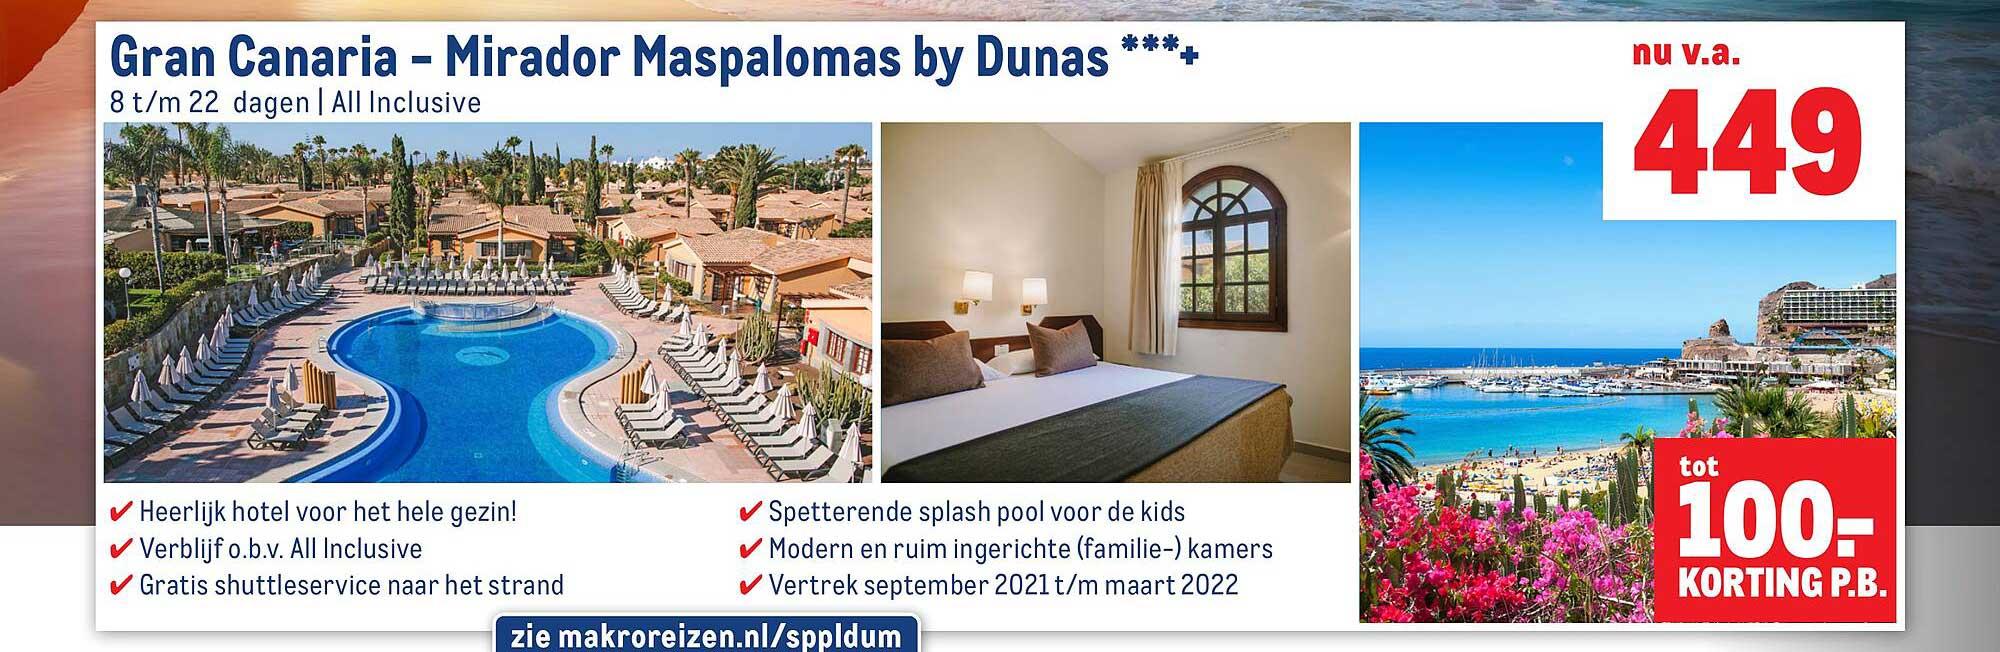 Makro Reizen Gran Canaria - Mirador Maspalomas By Dunas Toty 100.- Korting